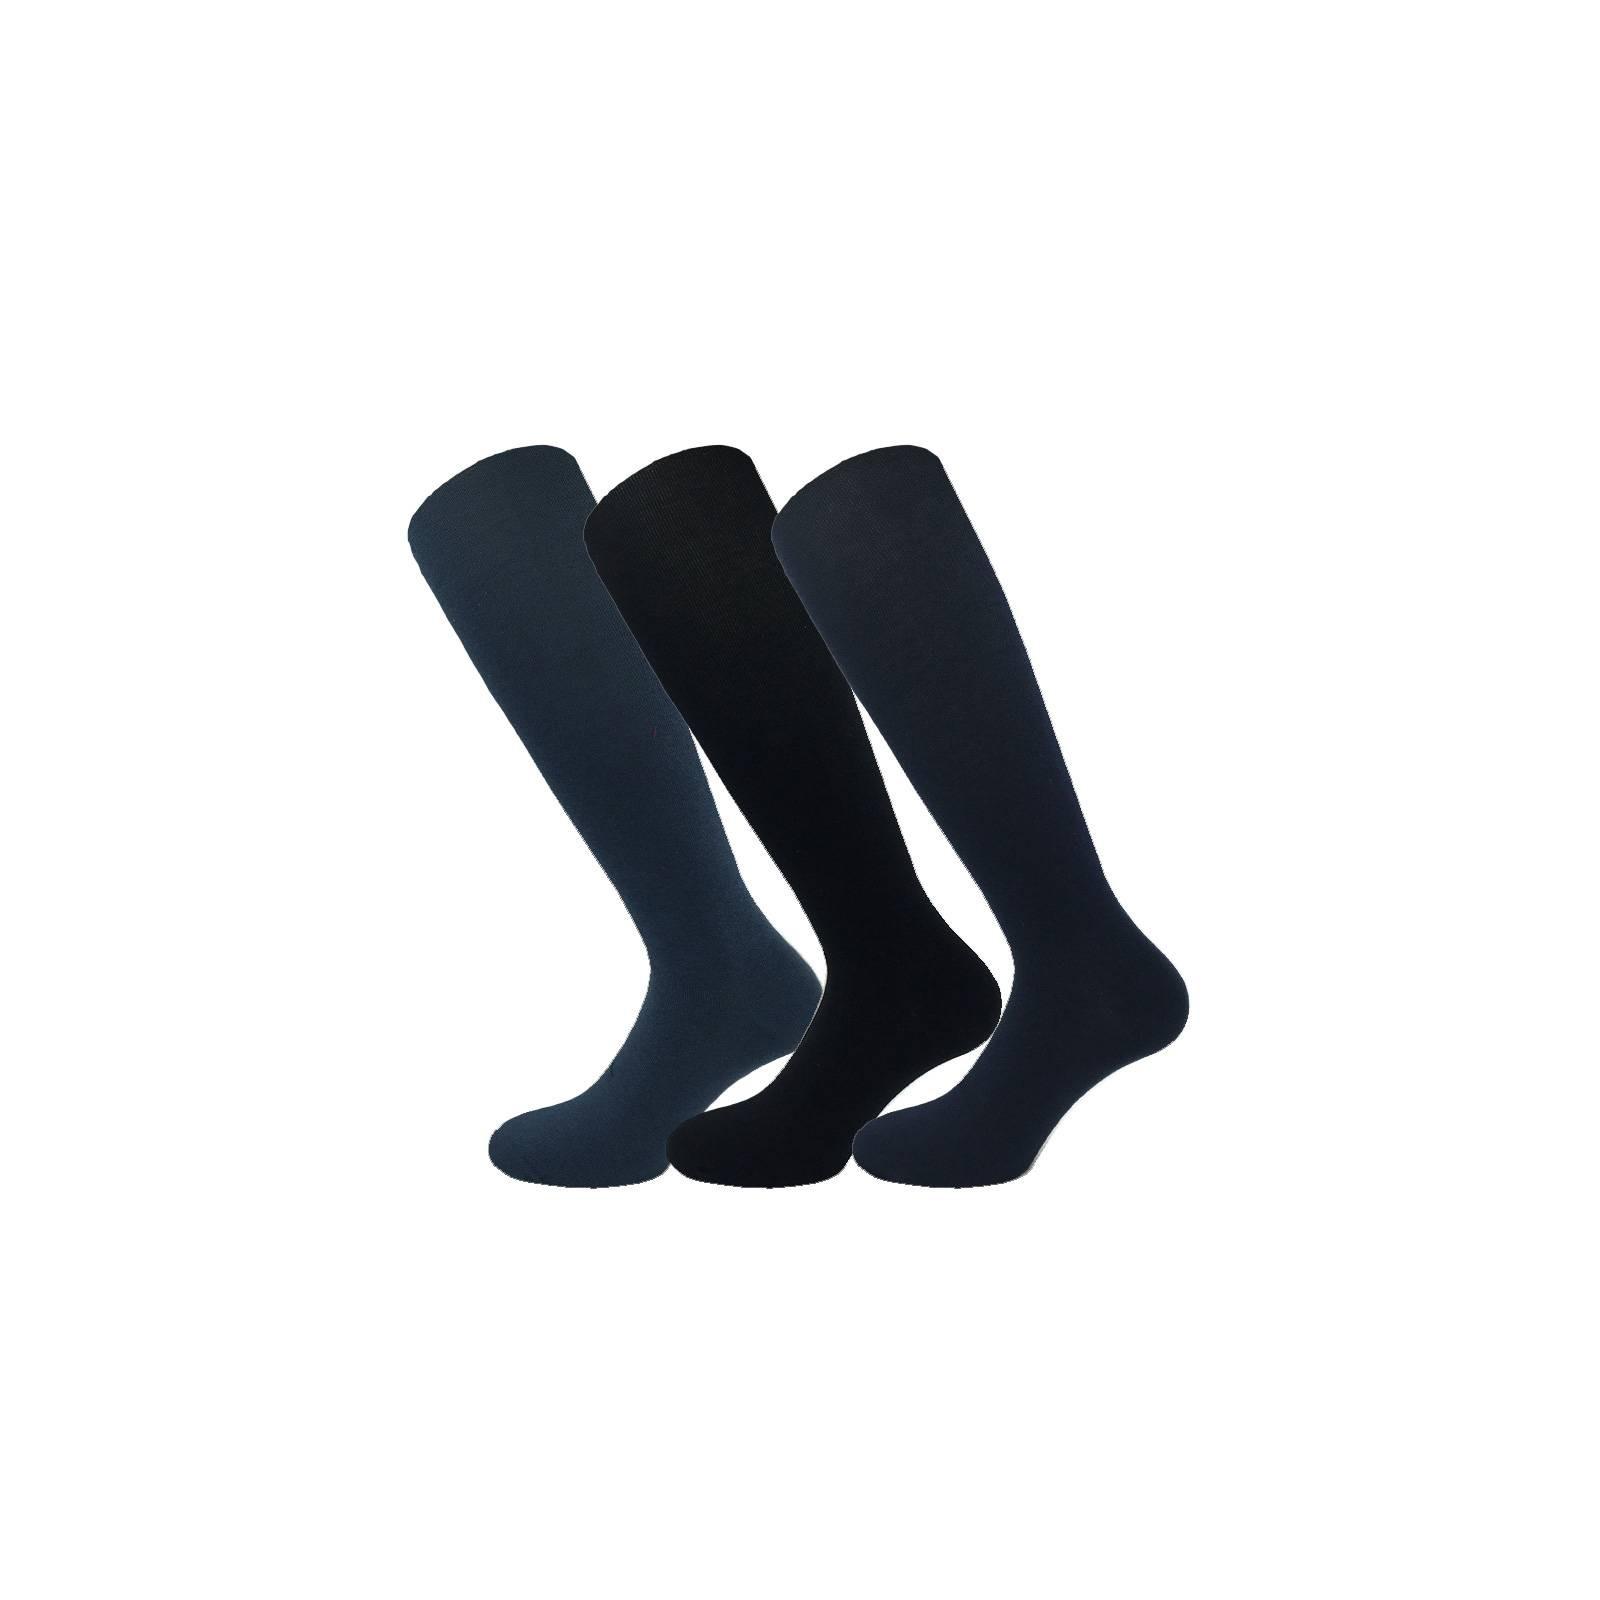 3a5c1ccd49 3 Paia calze in cotone caldo uomo lunghe CIOCCA - LADYC